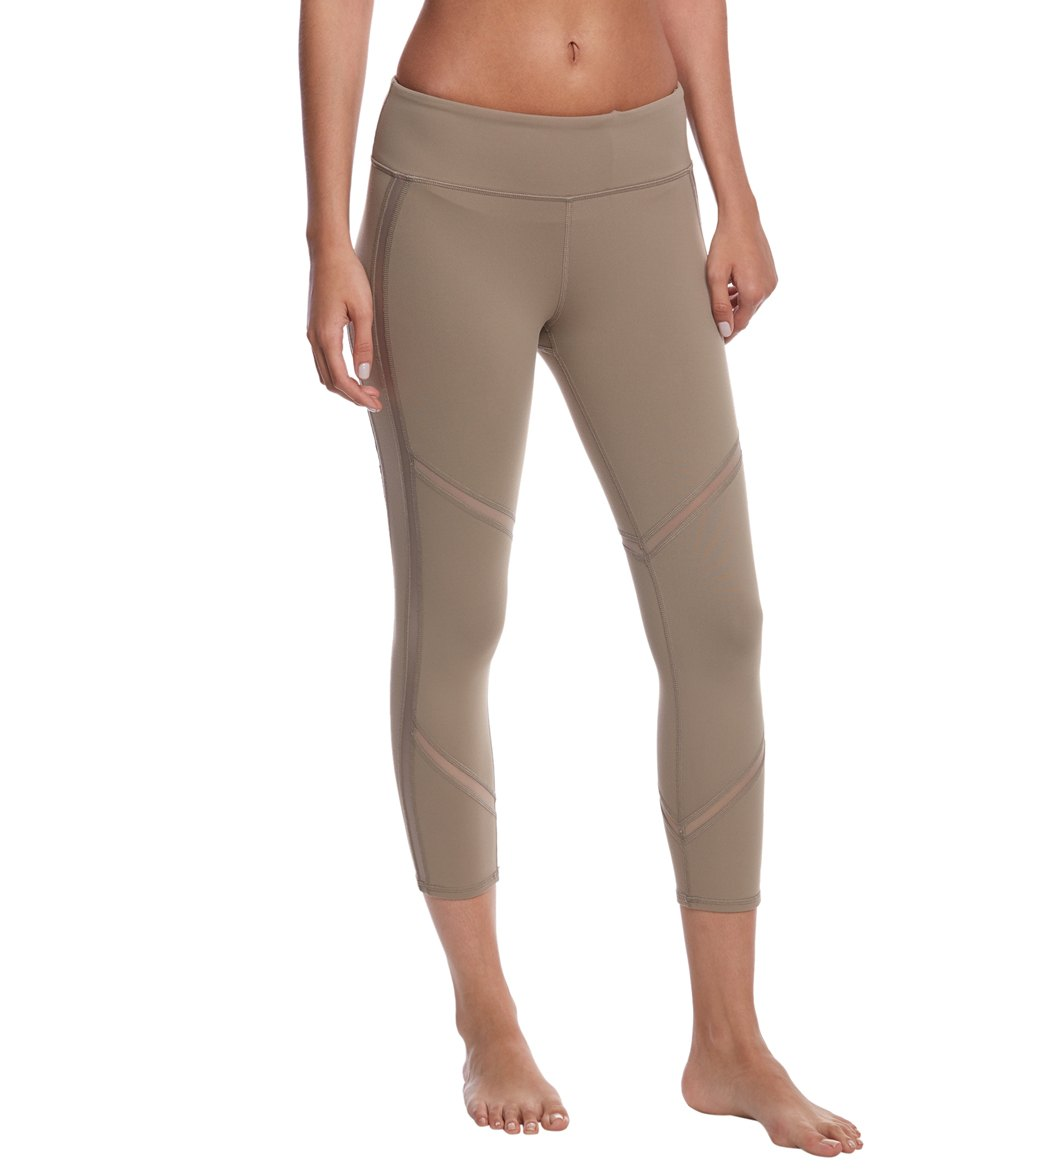 c156d30d60 Alo Yoga Continuity Yoga Capris at YogaOutlet.com - Free Shipping